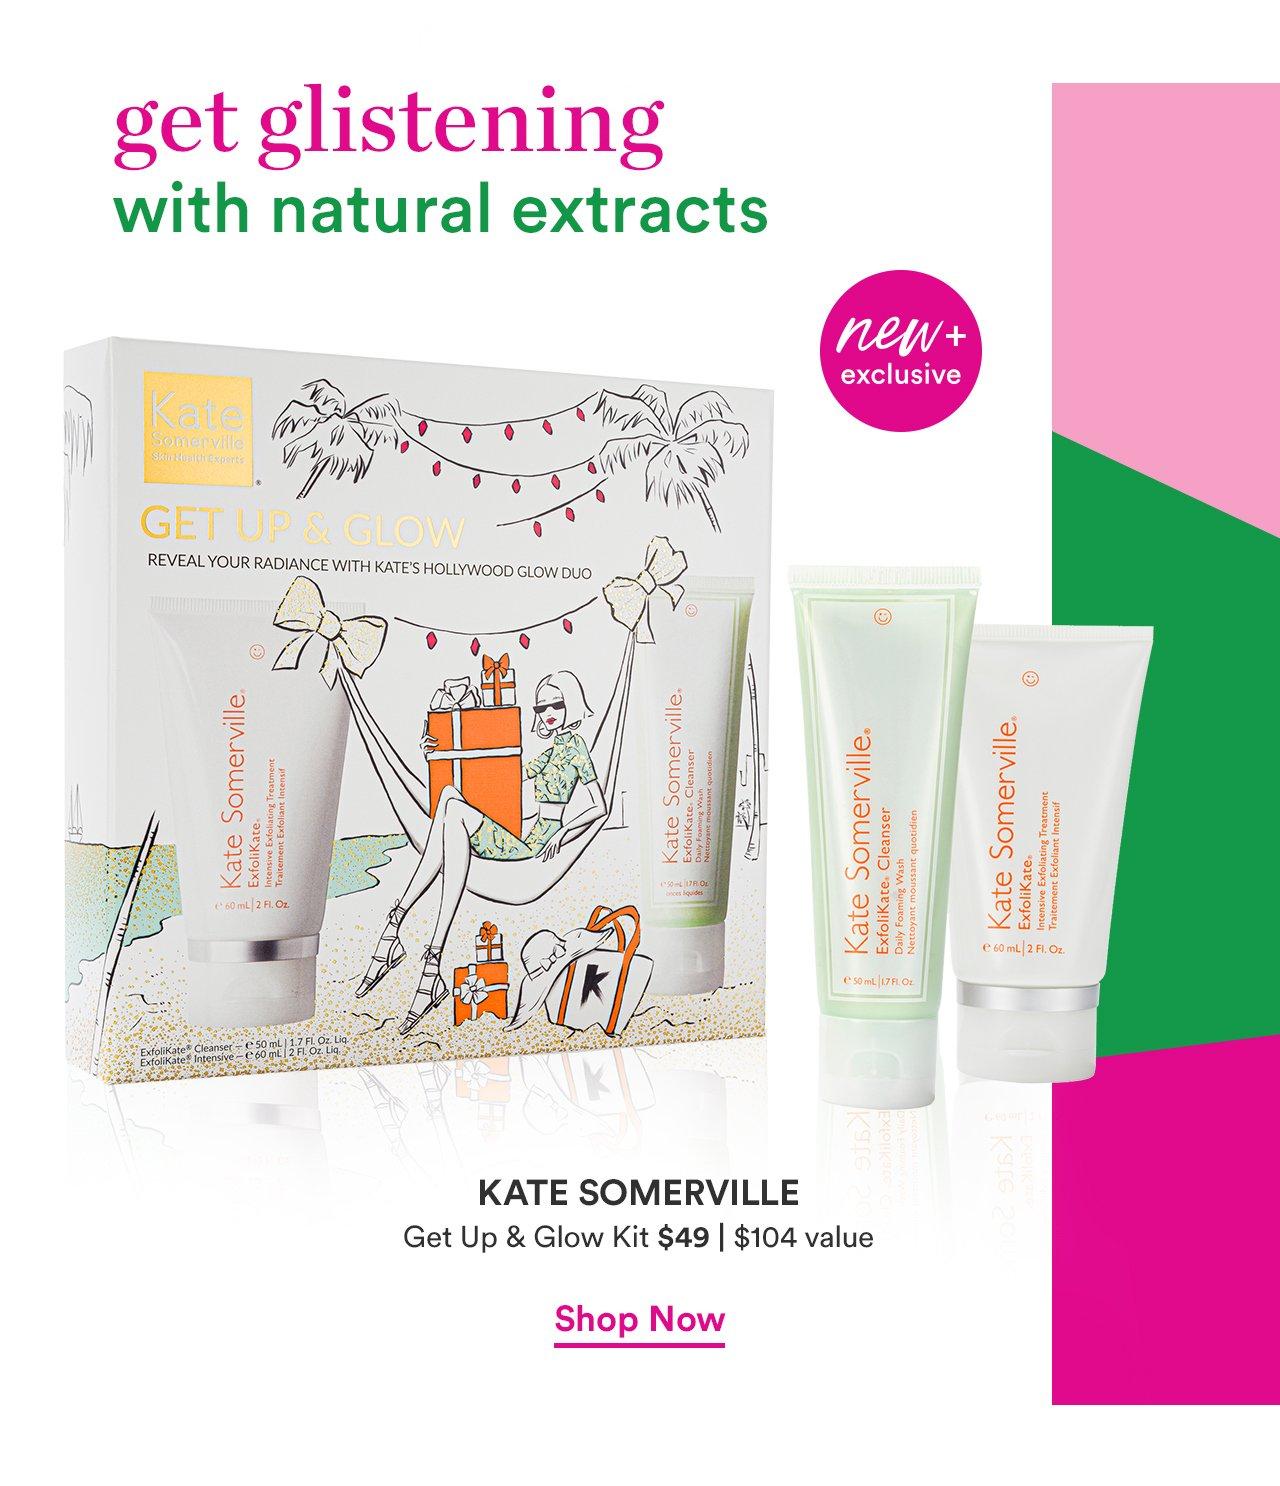 Kate Somerville | Get Up & Glow Kit $49 | Value $104